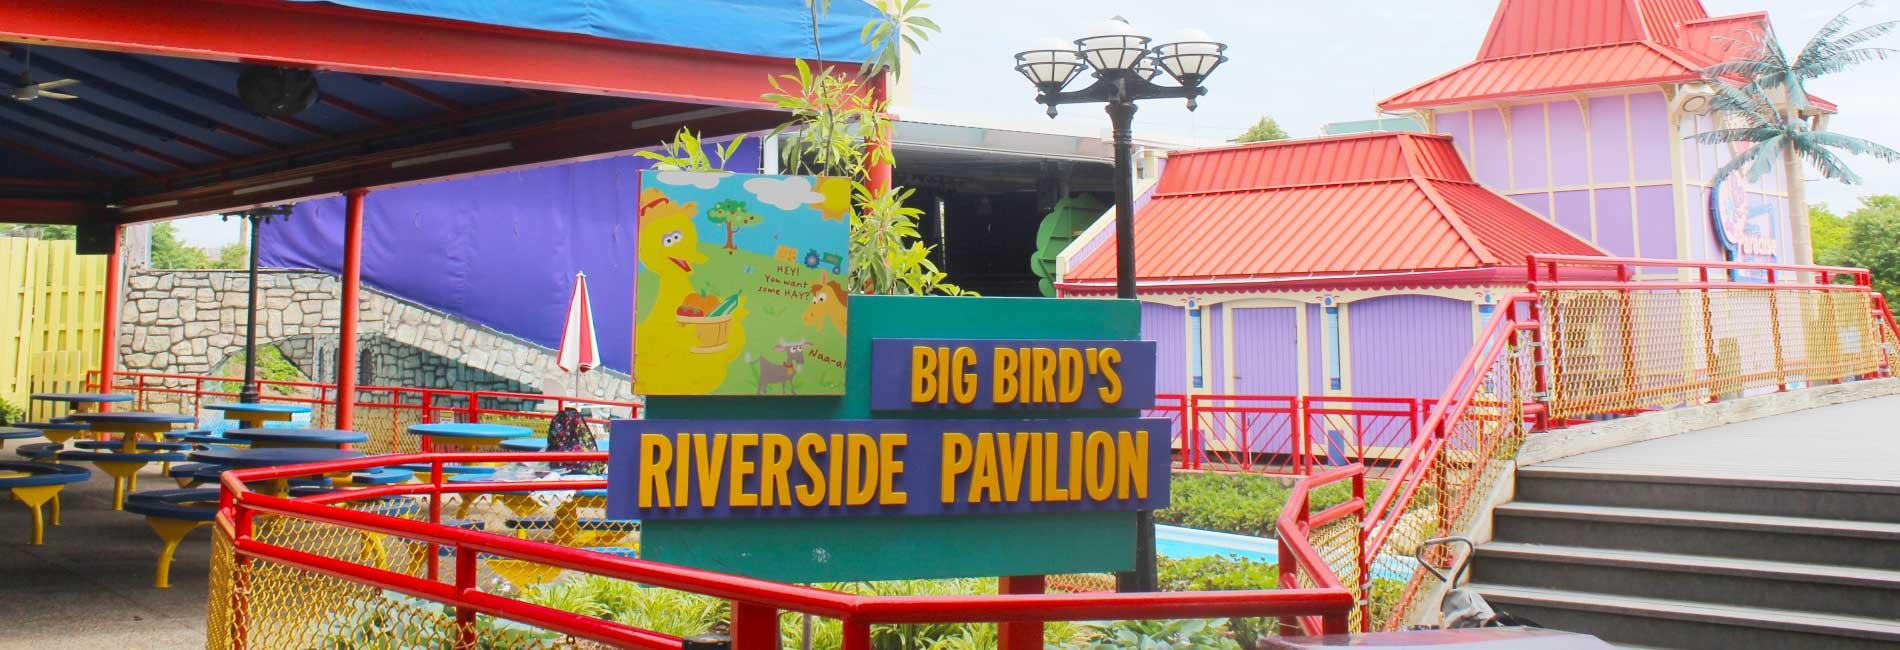 Big Birds Pavilion